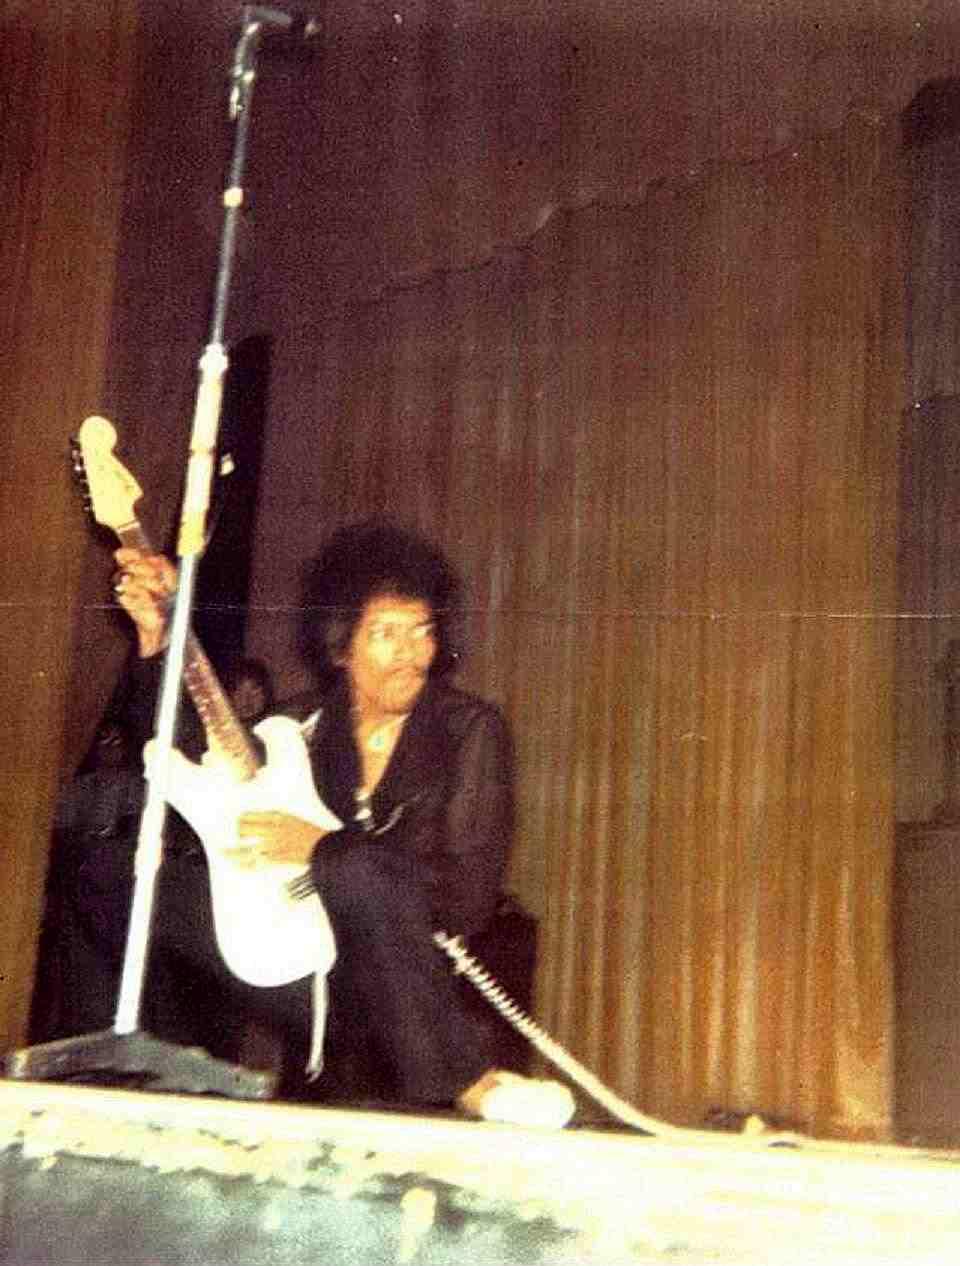 Baton Rouge (Independence Hall Lakeshore Auditorium) : 30 juillet 1968 23676419680730BatonRouge